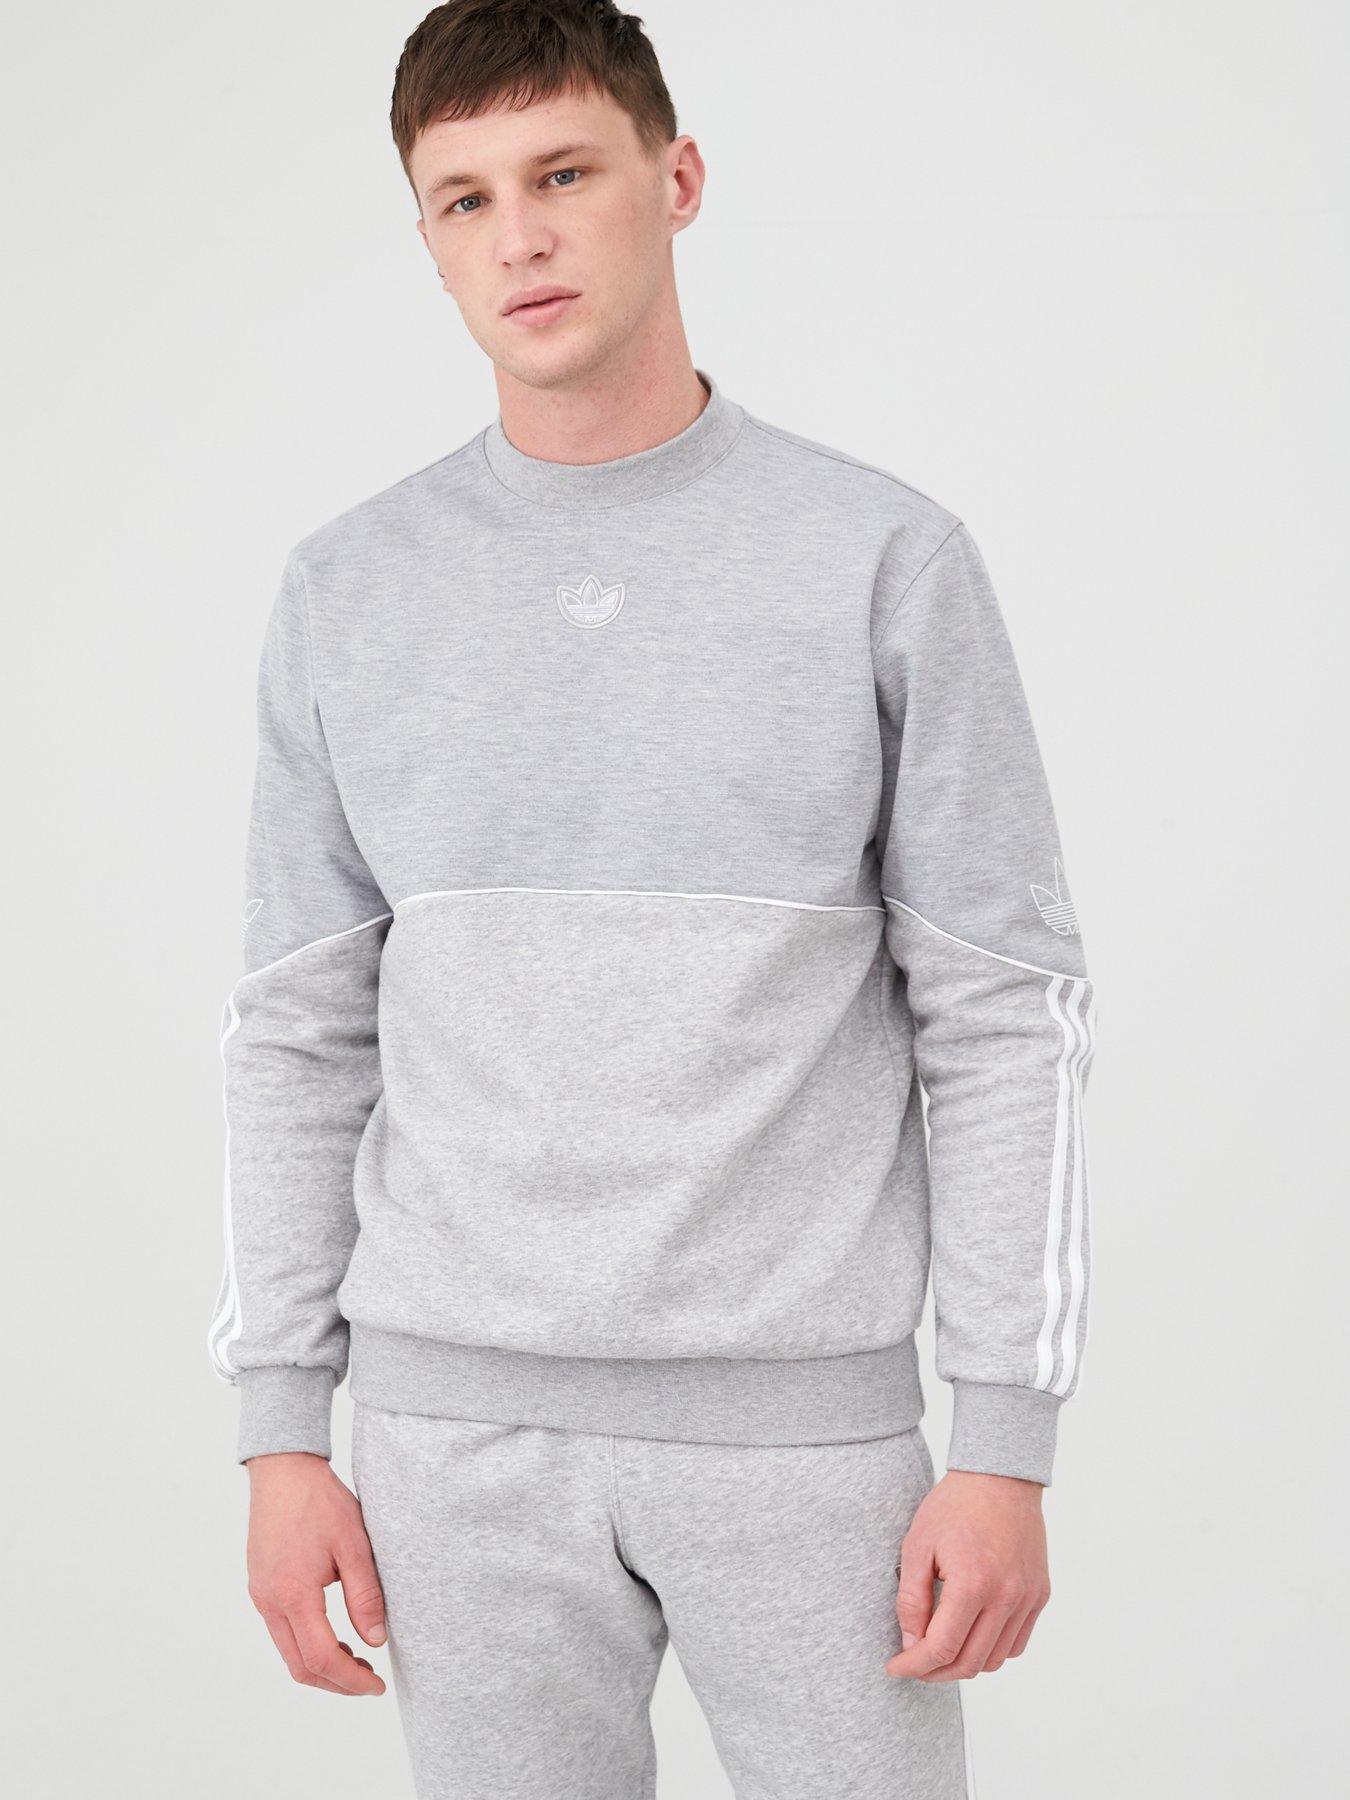 adidas Mens Core18 Sweater Short Sleeve Crew Neck Sweatshirt